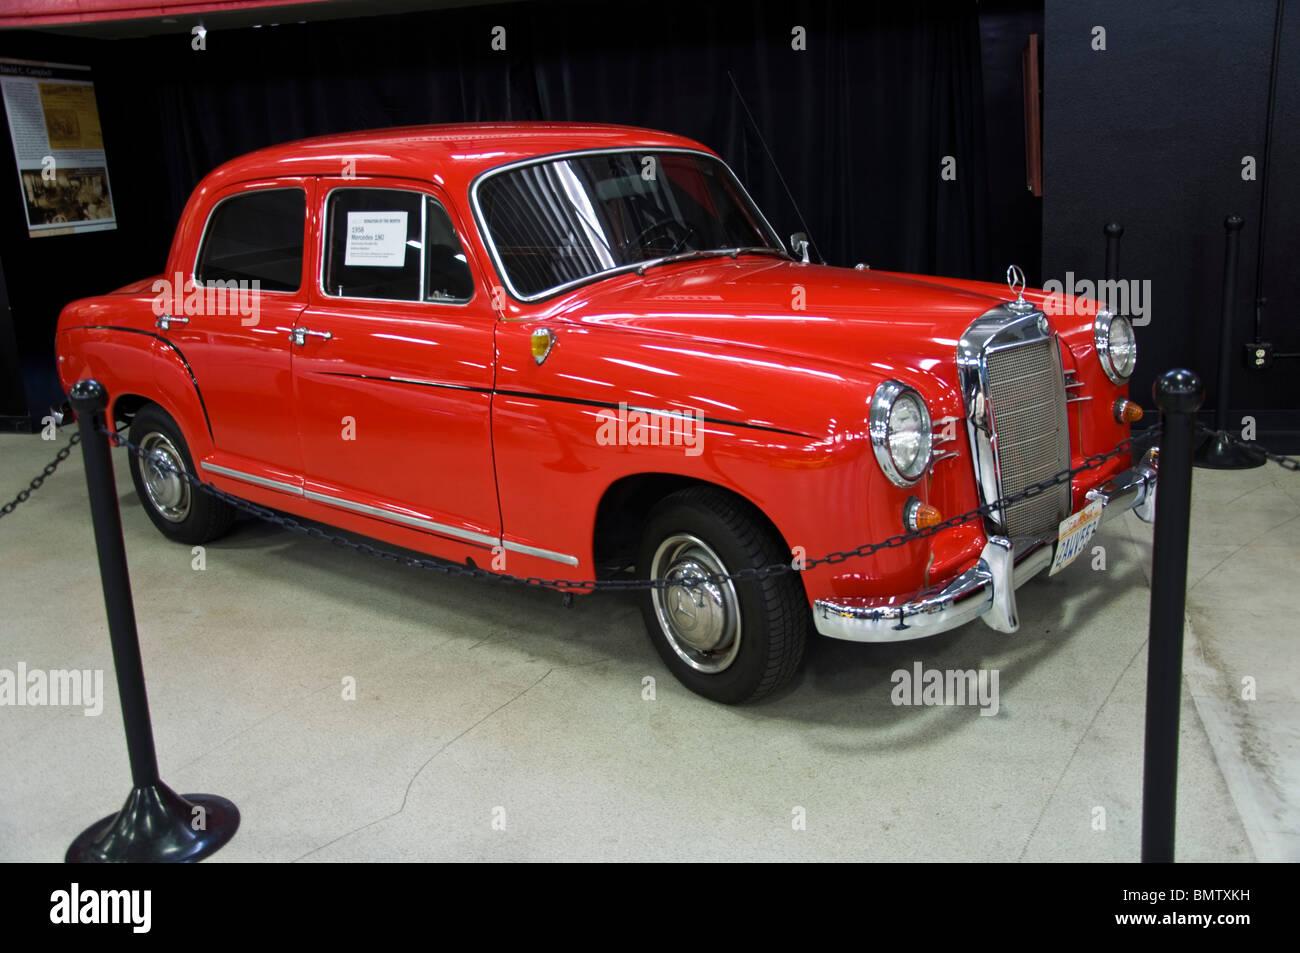 Vintage mercedes benz stock photo royalty free image for Mercedes benz stock